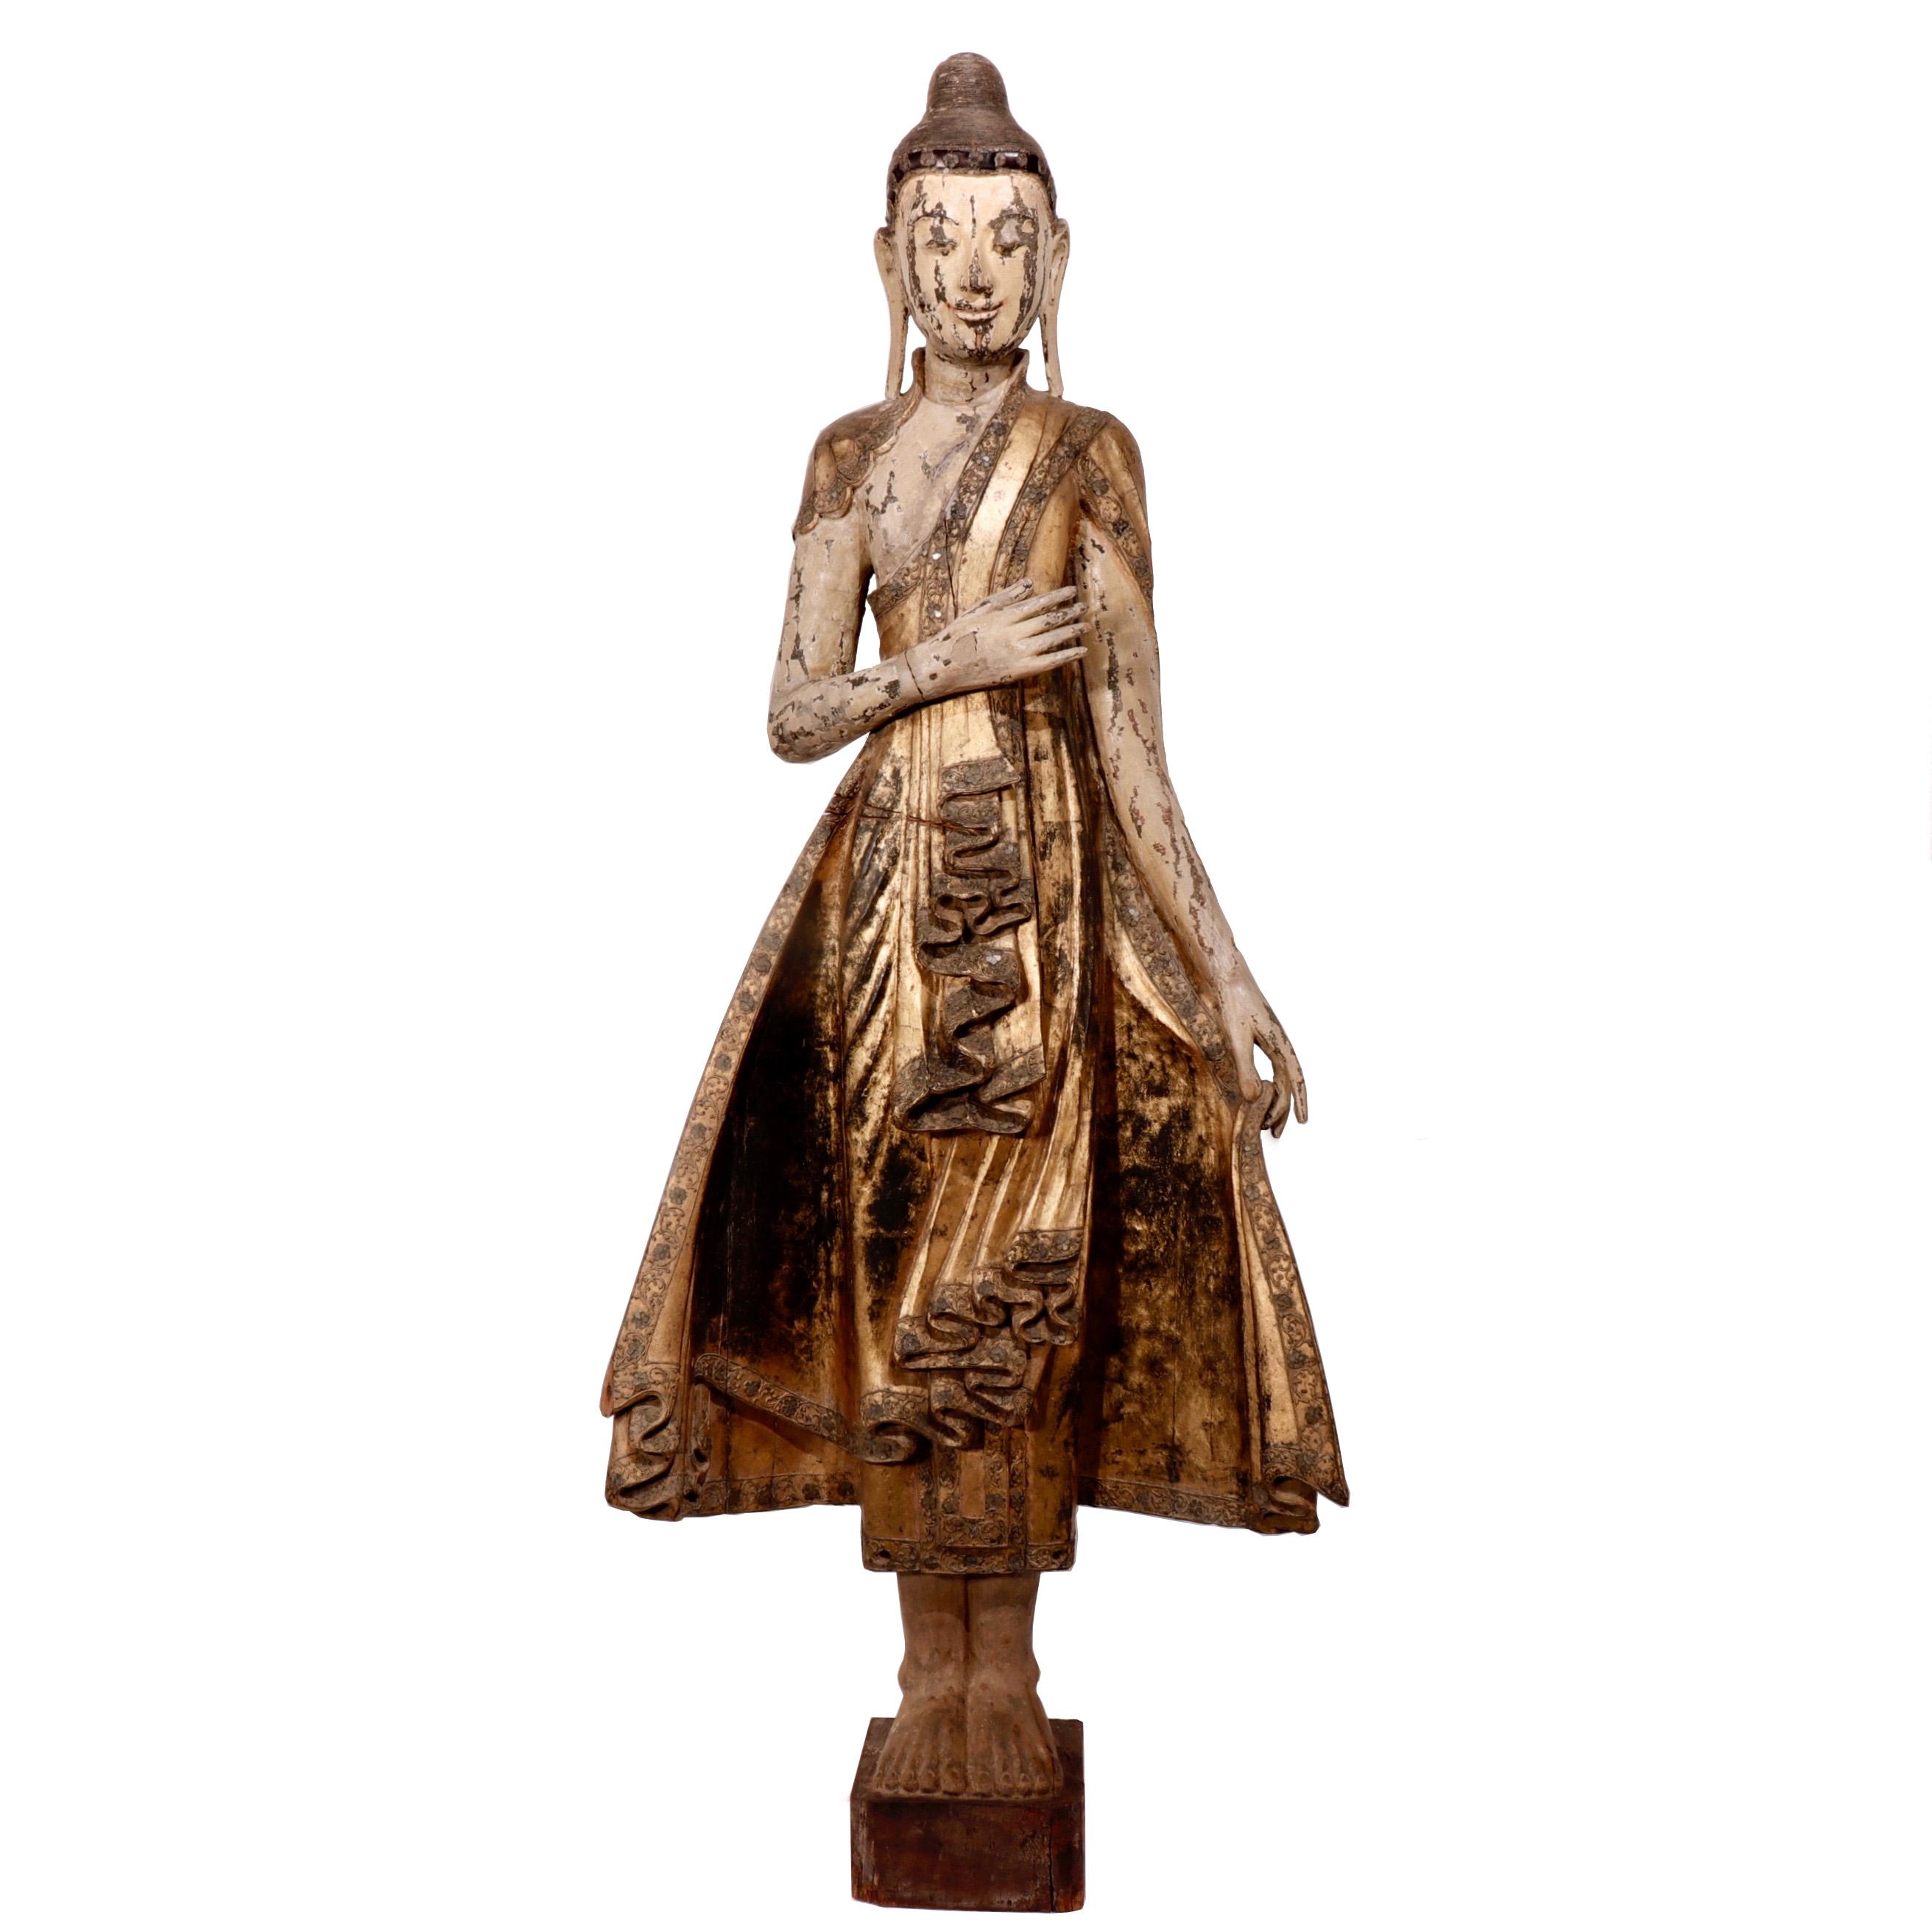 UH10051: Standing Mandalay Buddha Sculpture